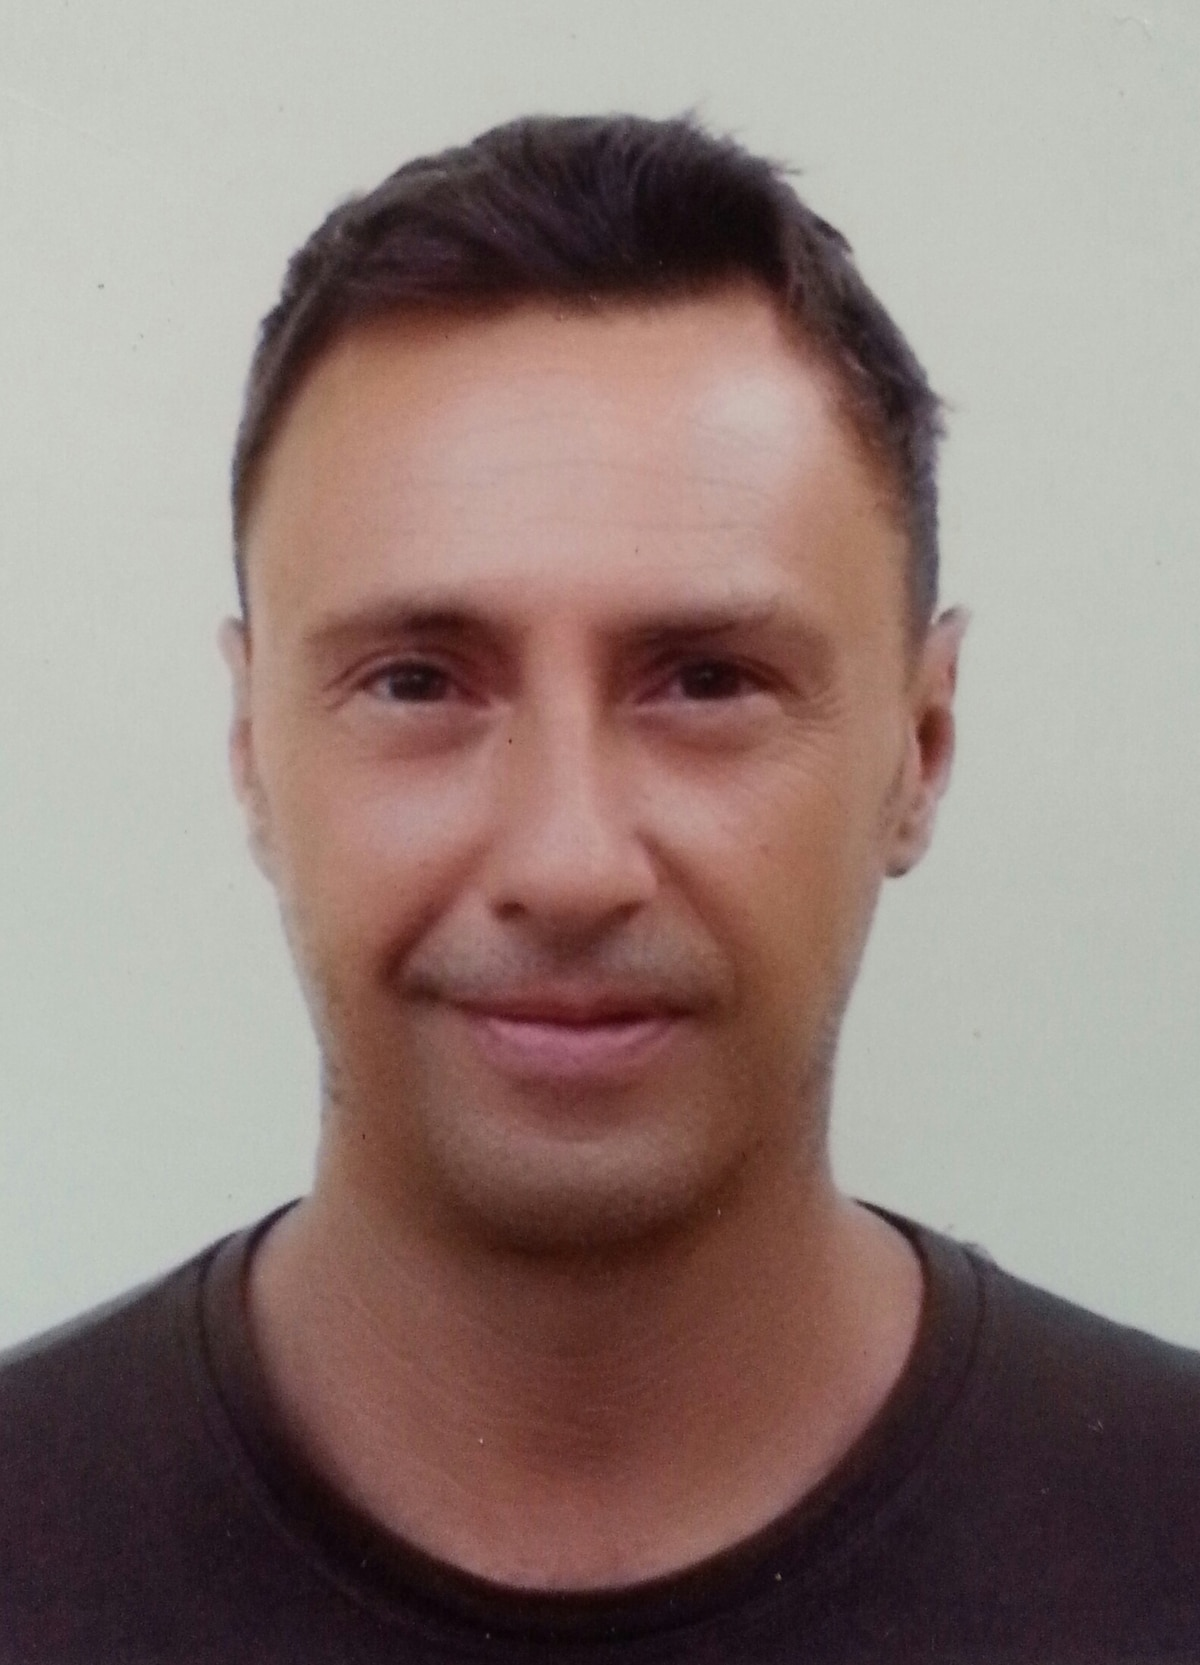 Davide From Milan, Italy